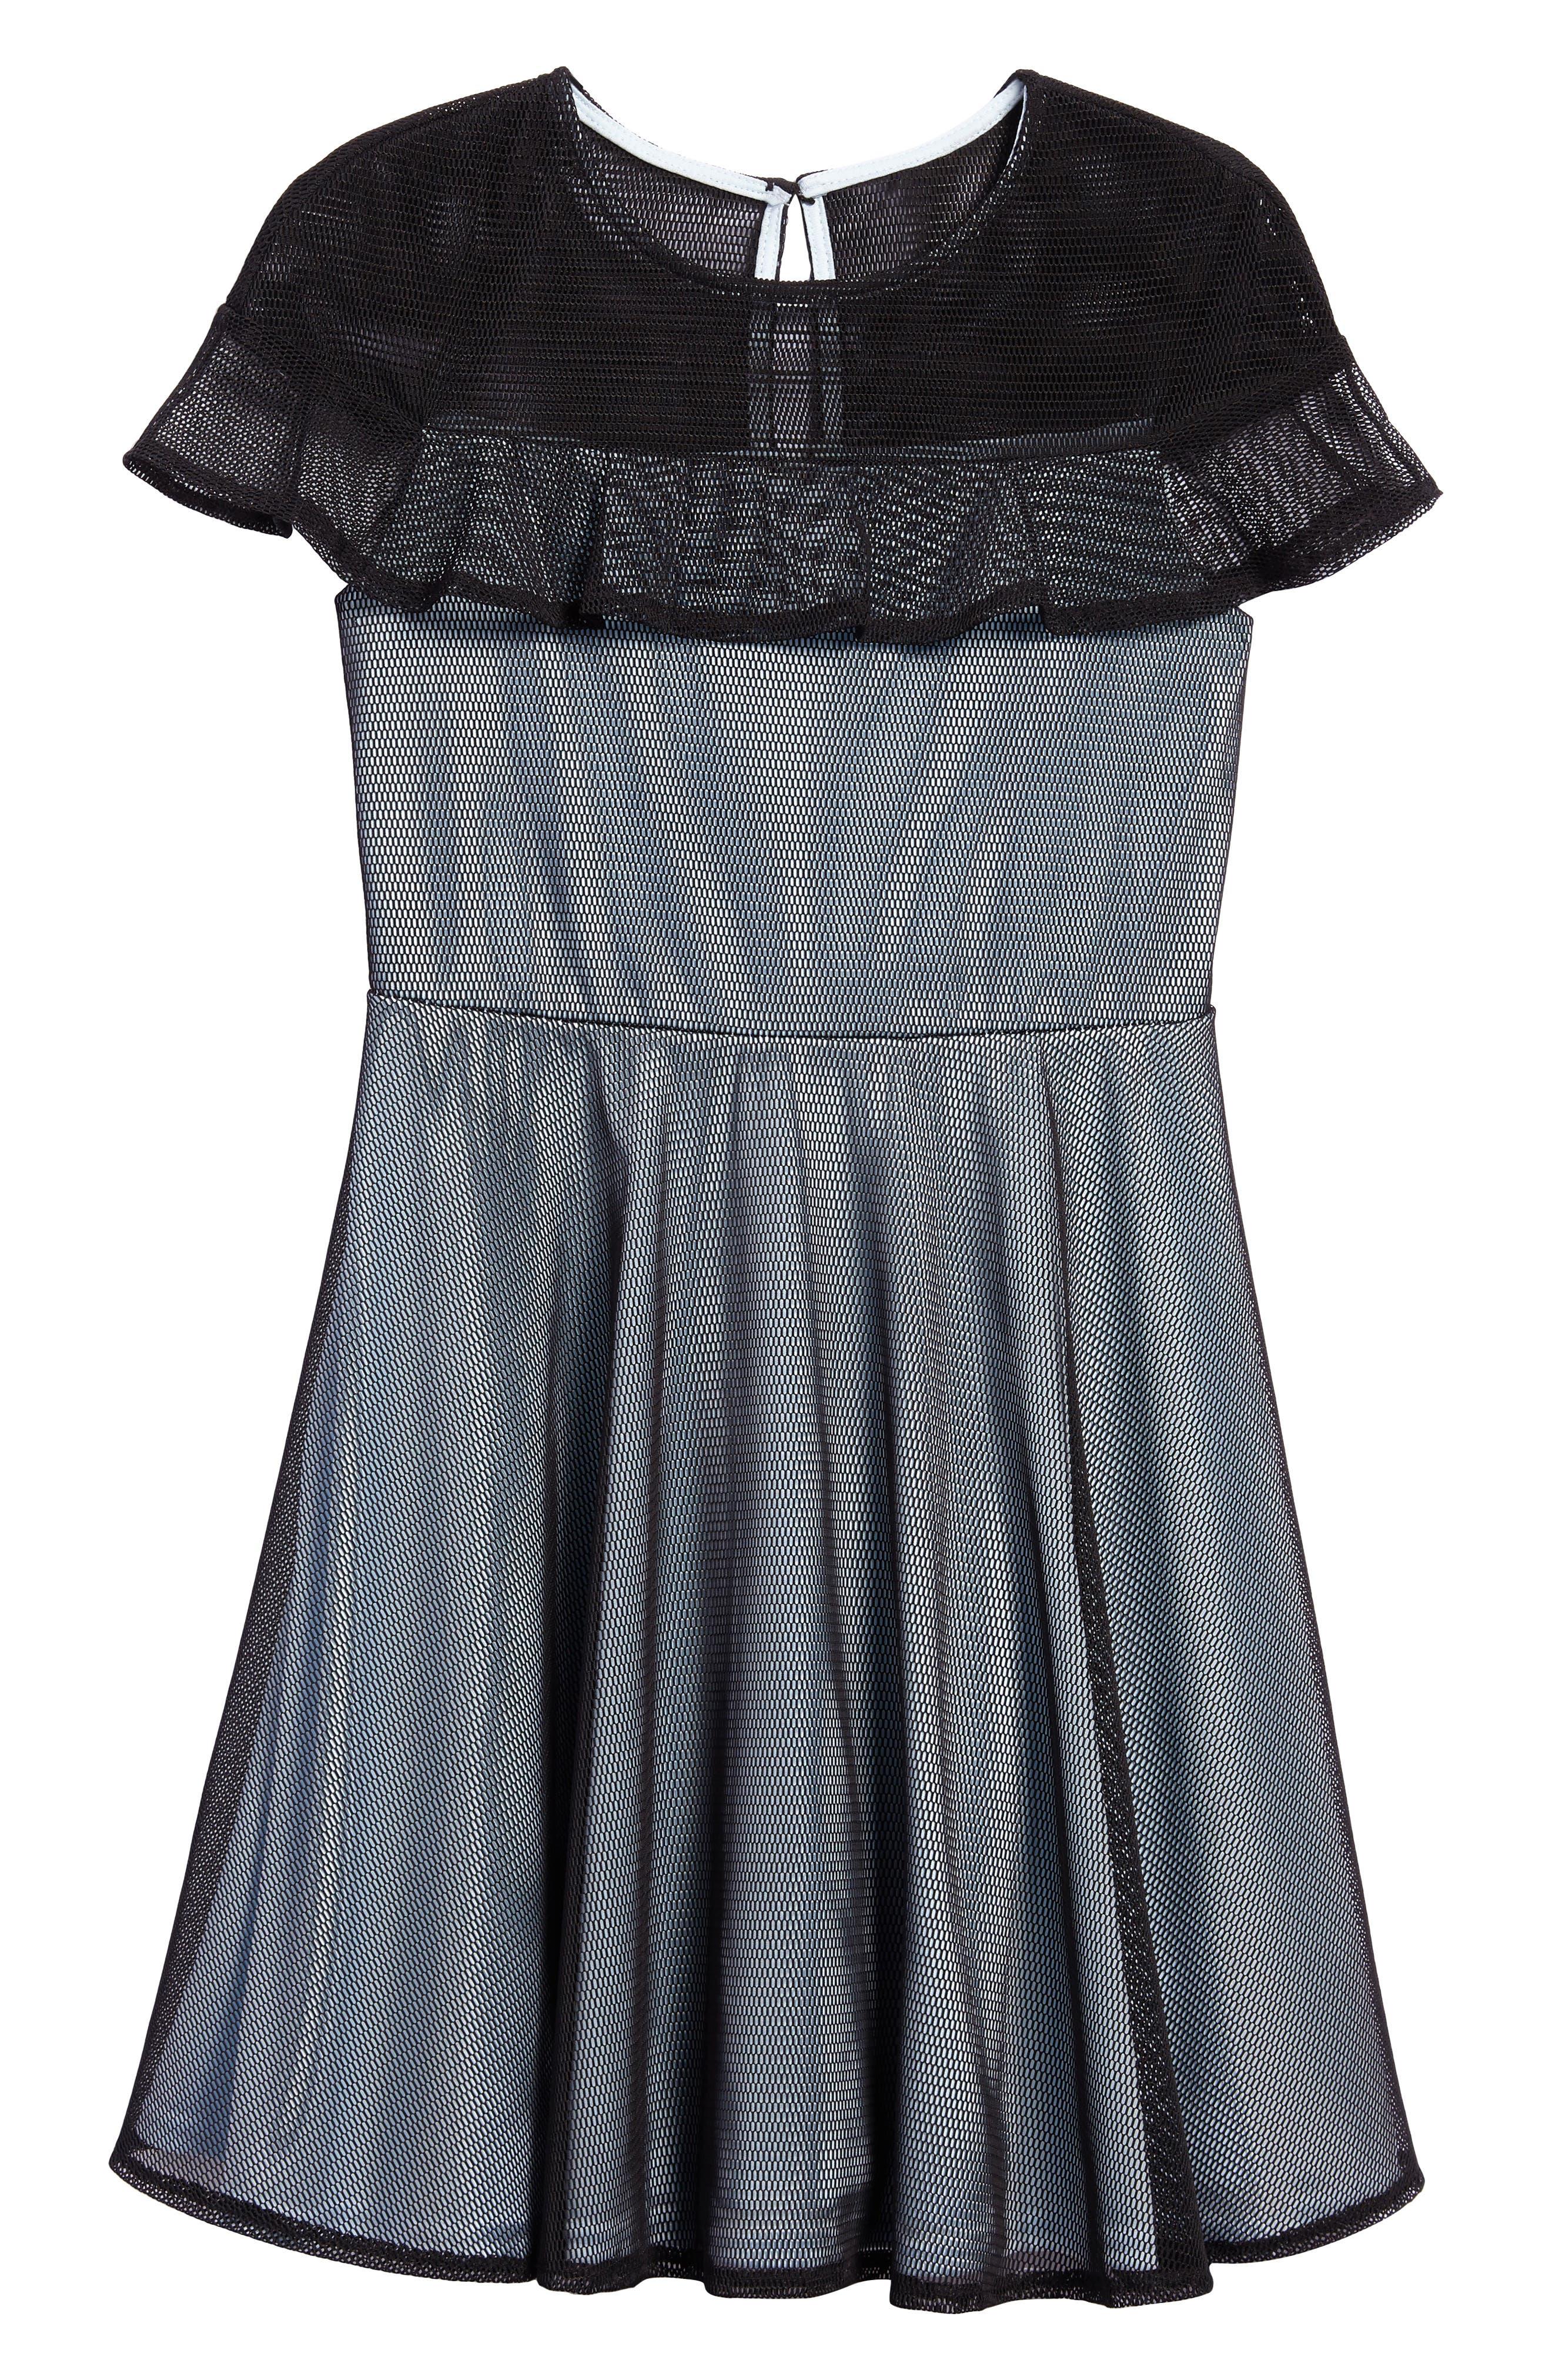 Ruffle Mesh Overlay Dress,                             Main thumbnail 1, color,                             Black